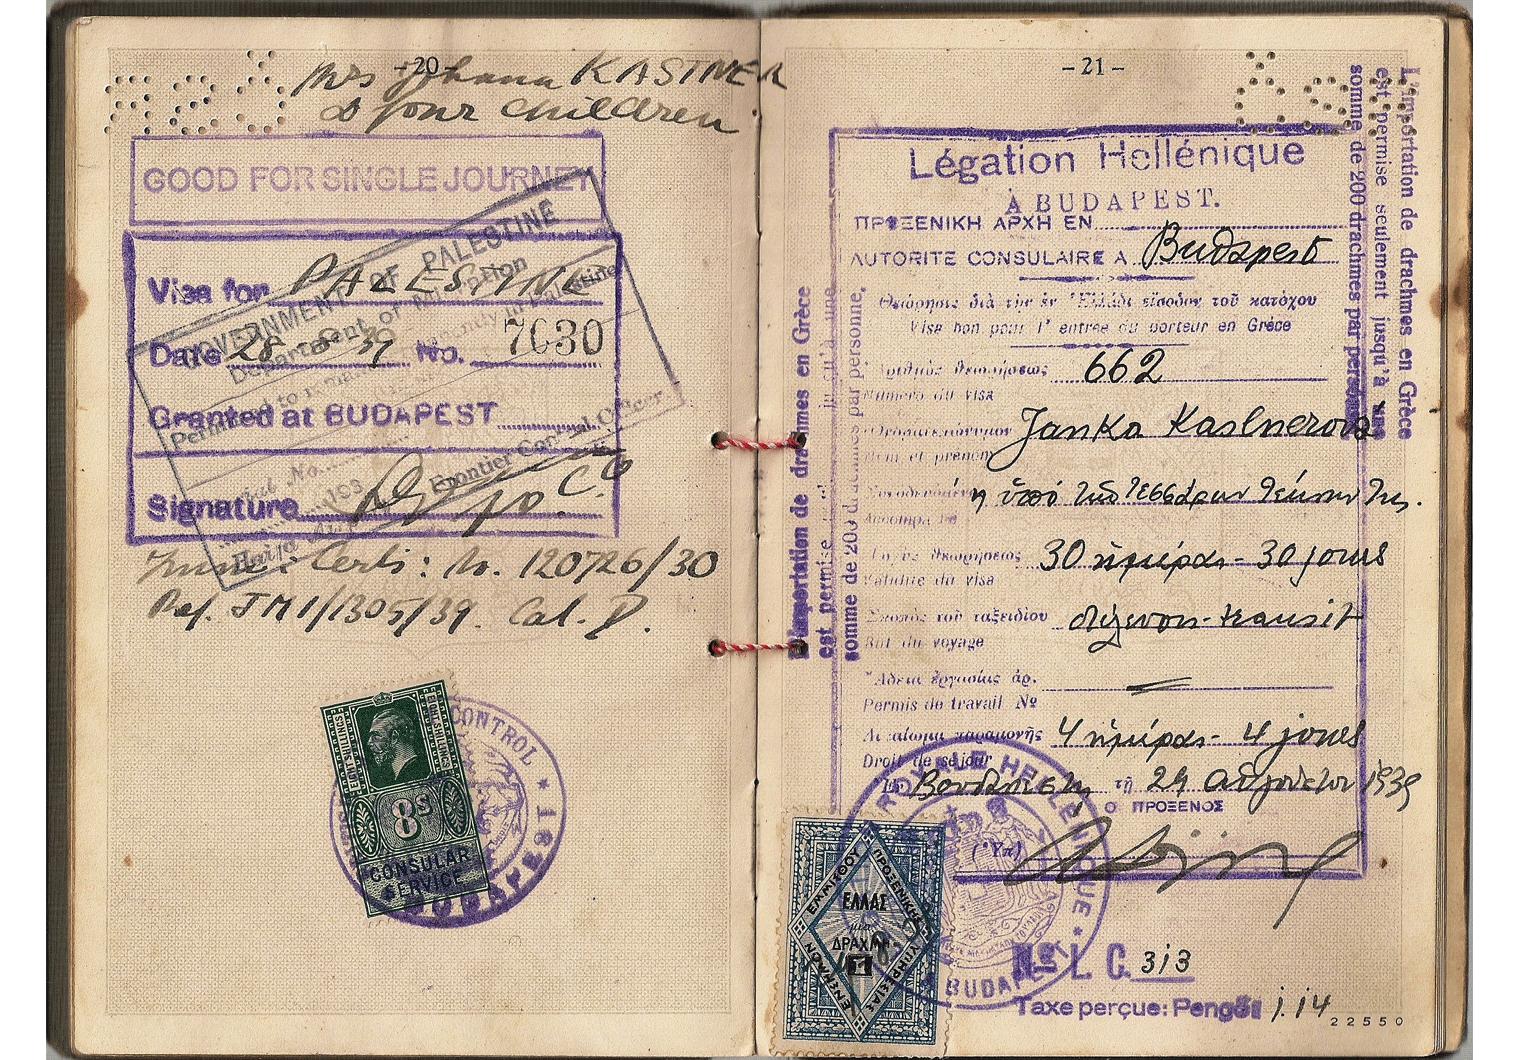 WW2 British Palestine visa